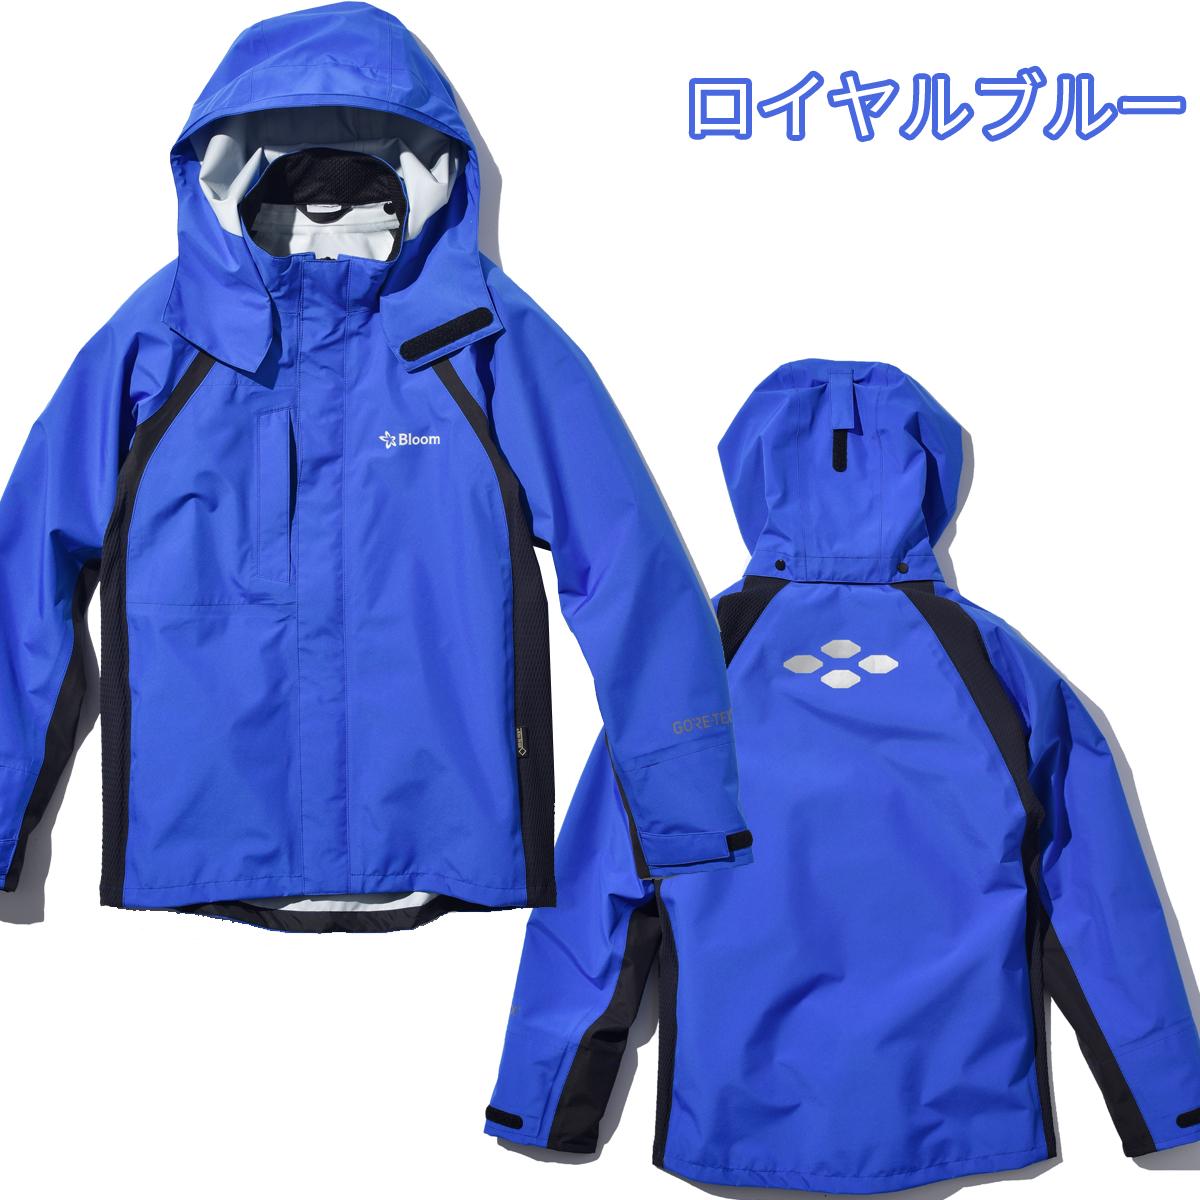 bloom ジャケット ブルー